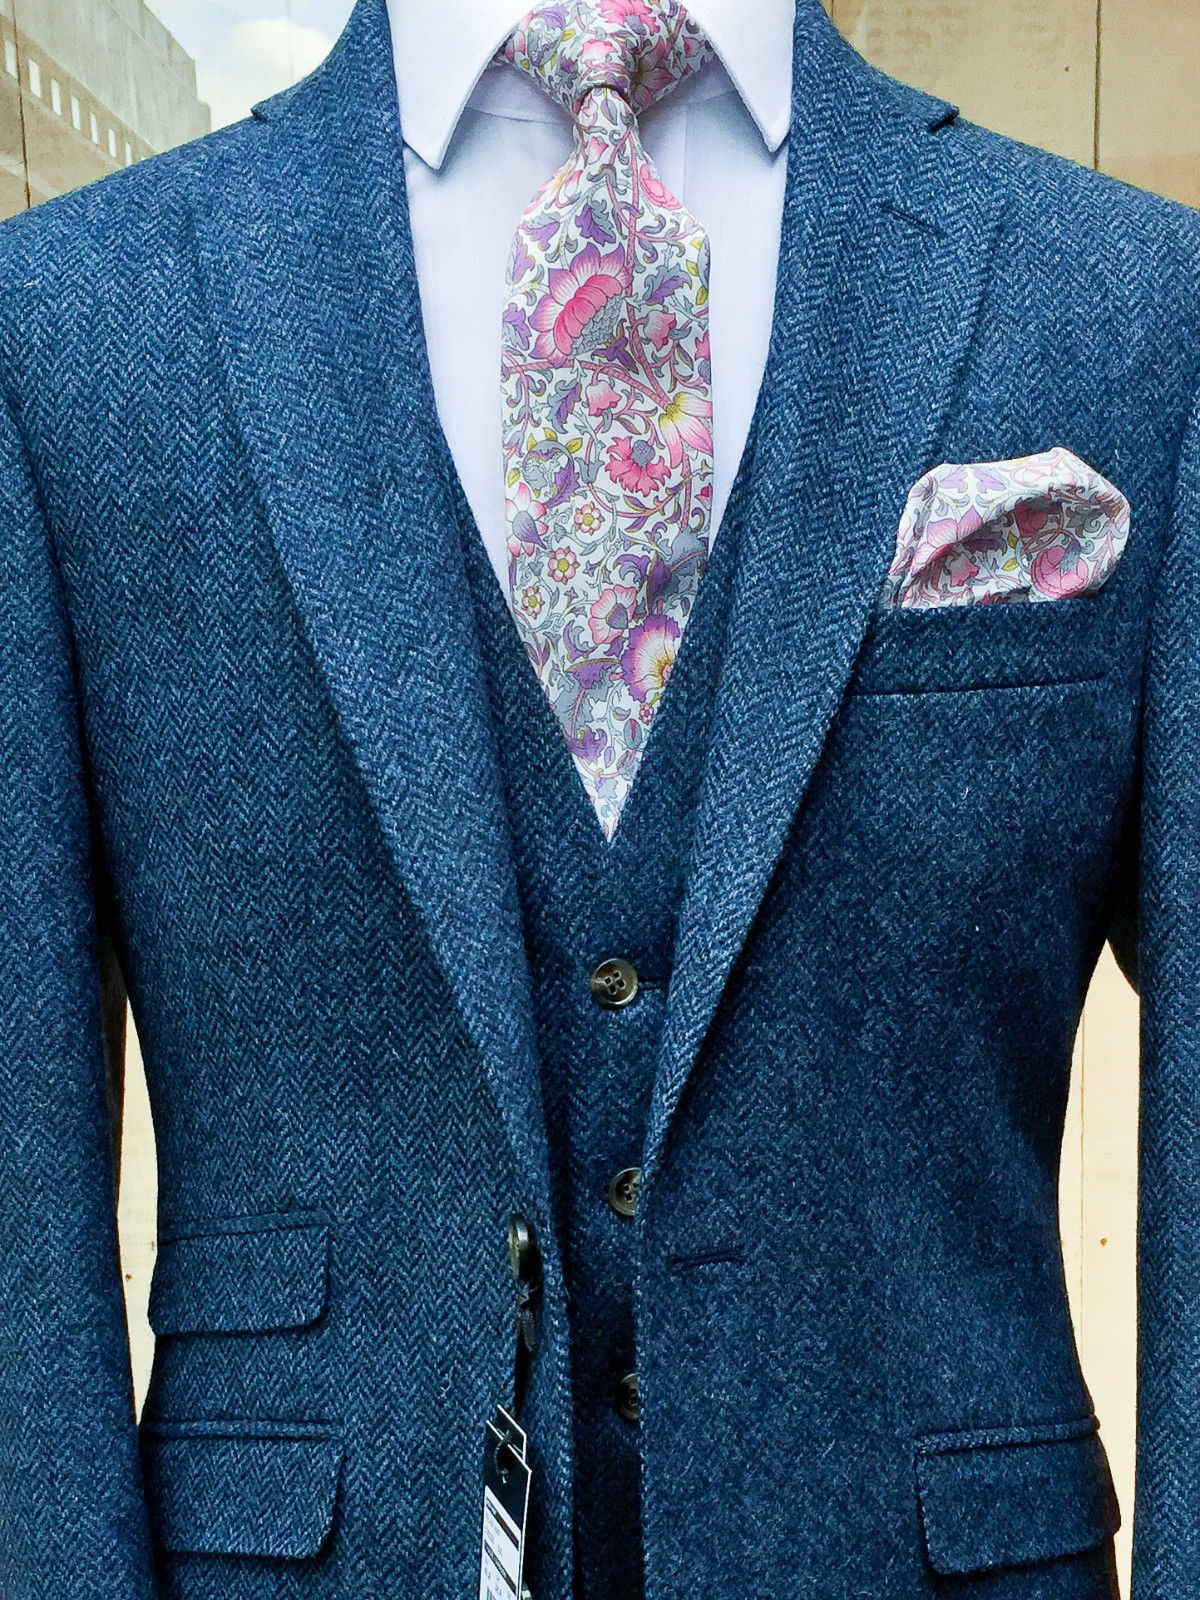 New Classic Stripe Fleck Men/'s Suit 3 Pcs Blue Tuxedo 38 40 42 44 46+Custom 2018